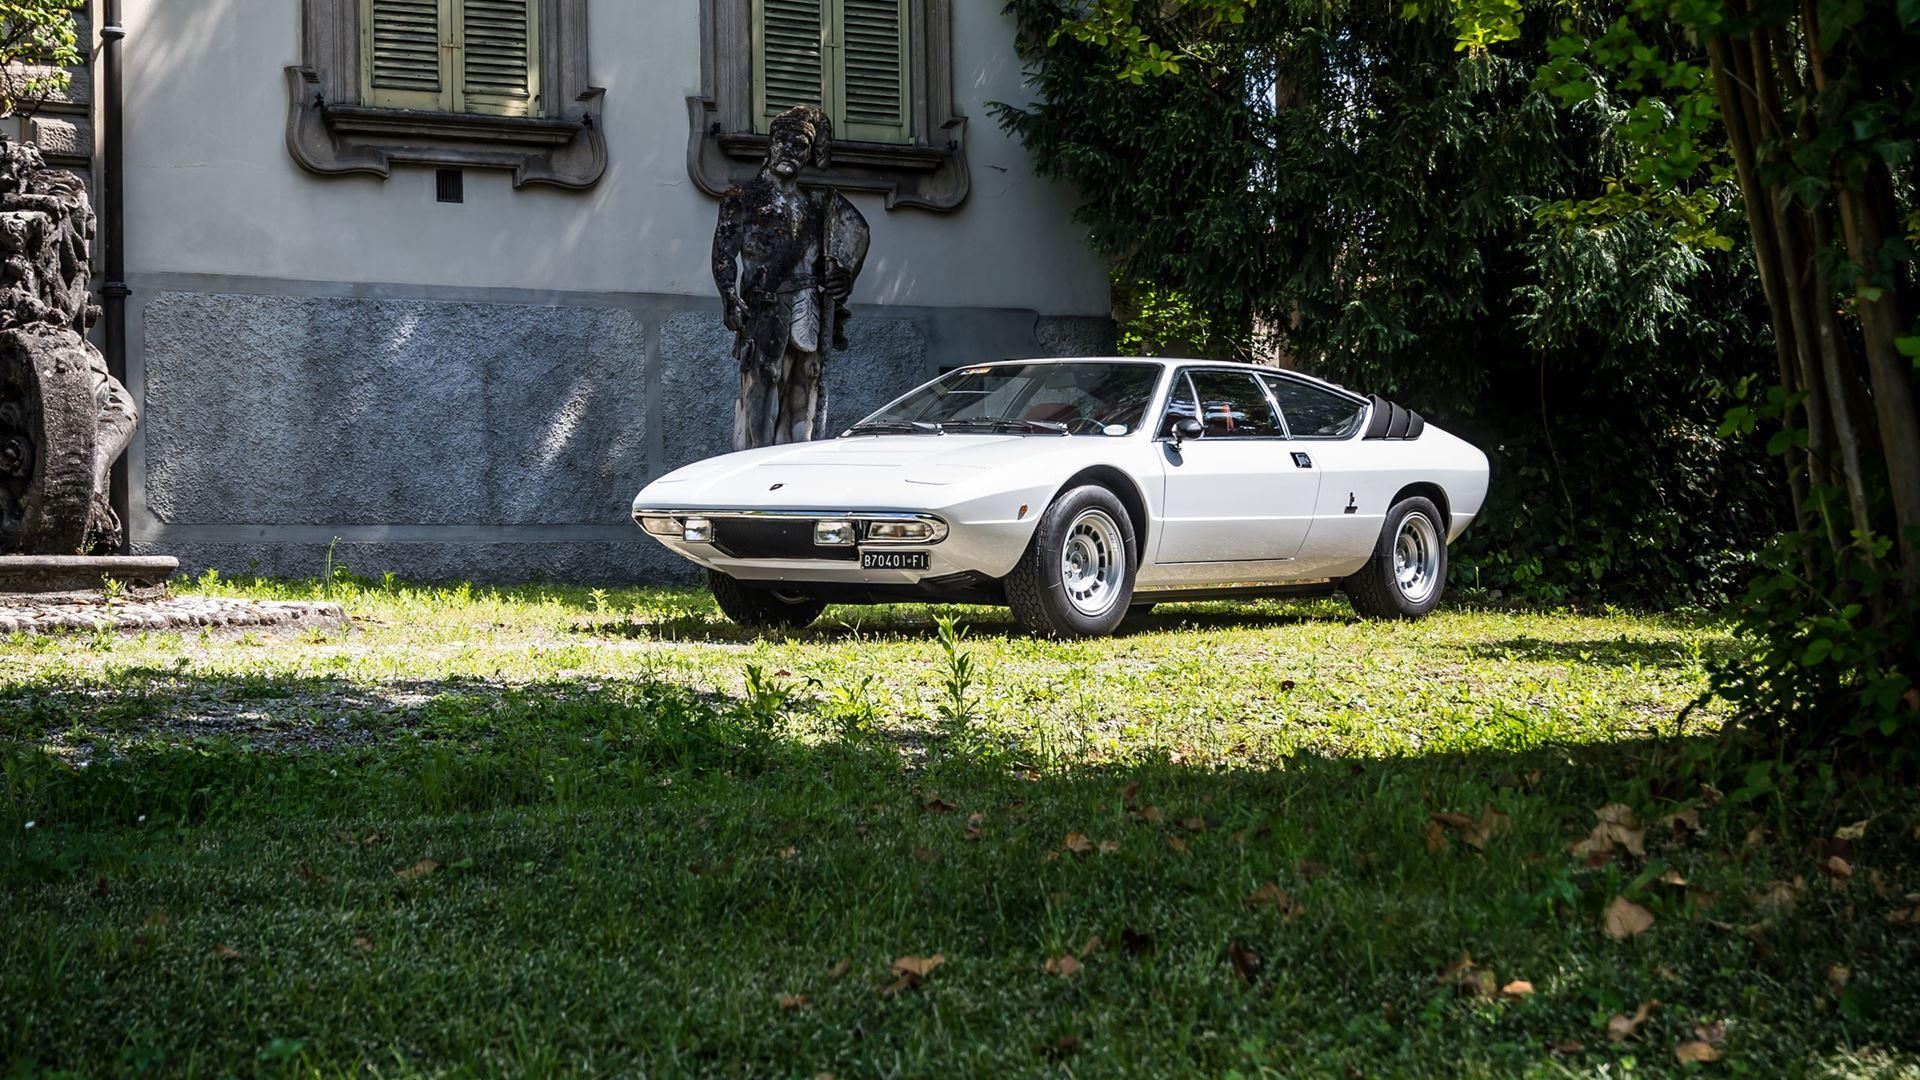 Lamborghini celebrates the 50th Anniversary of the Urraco - Image 4